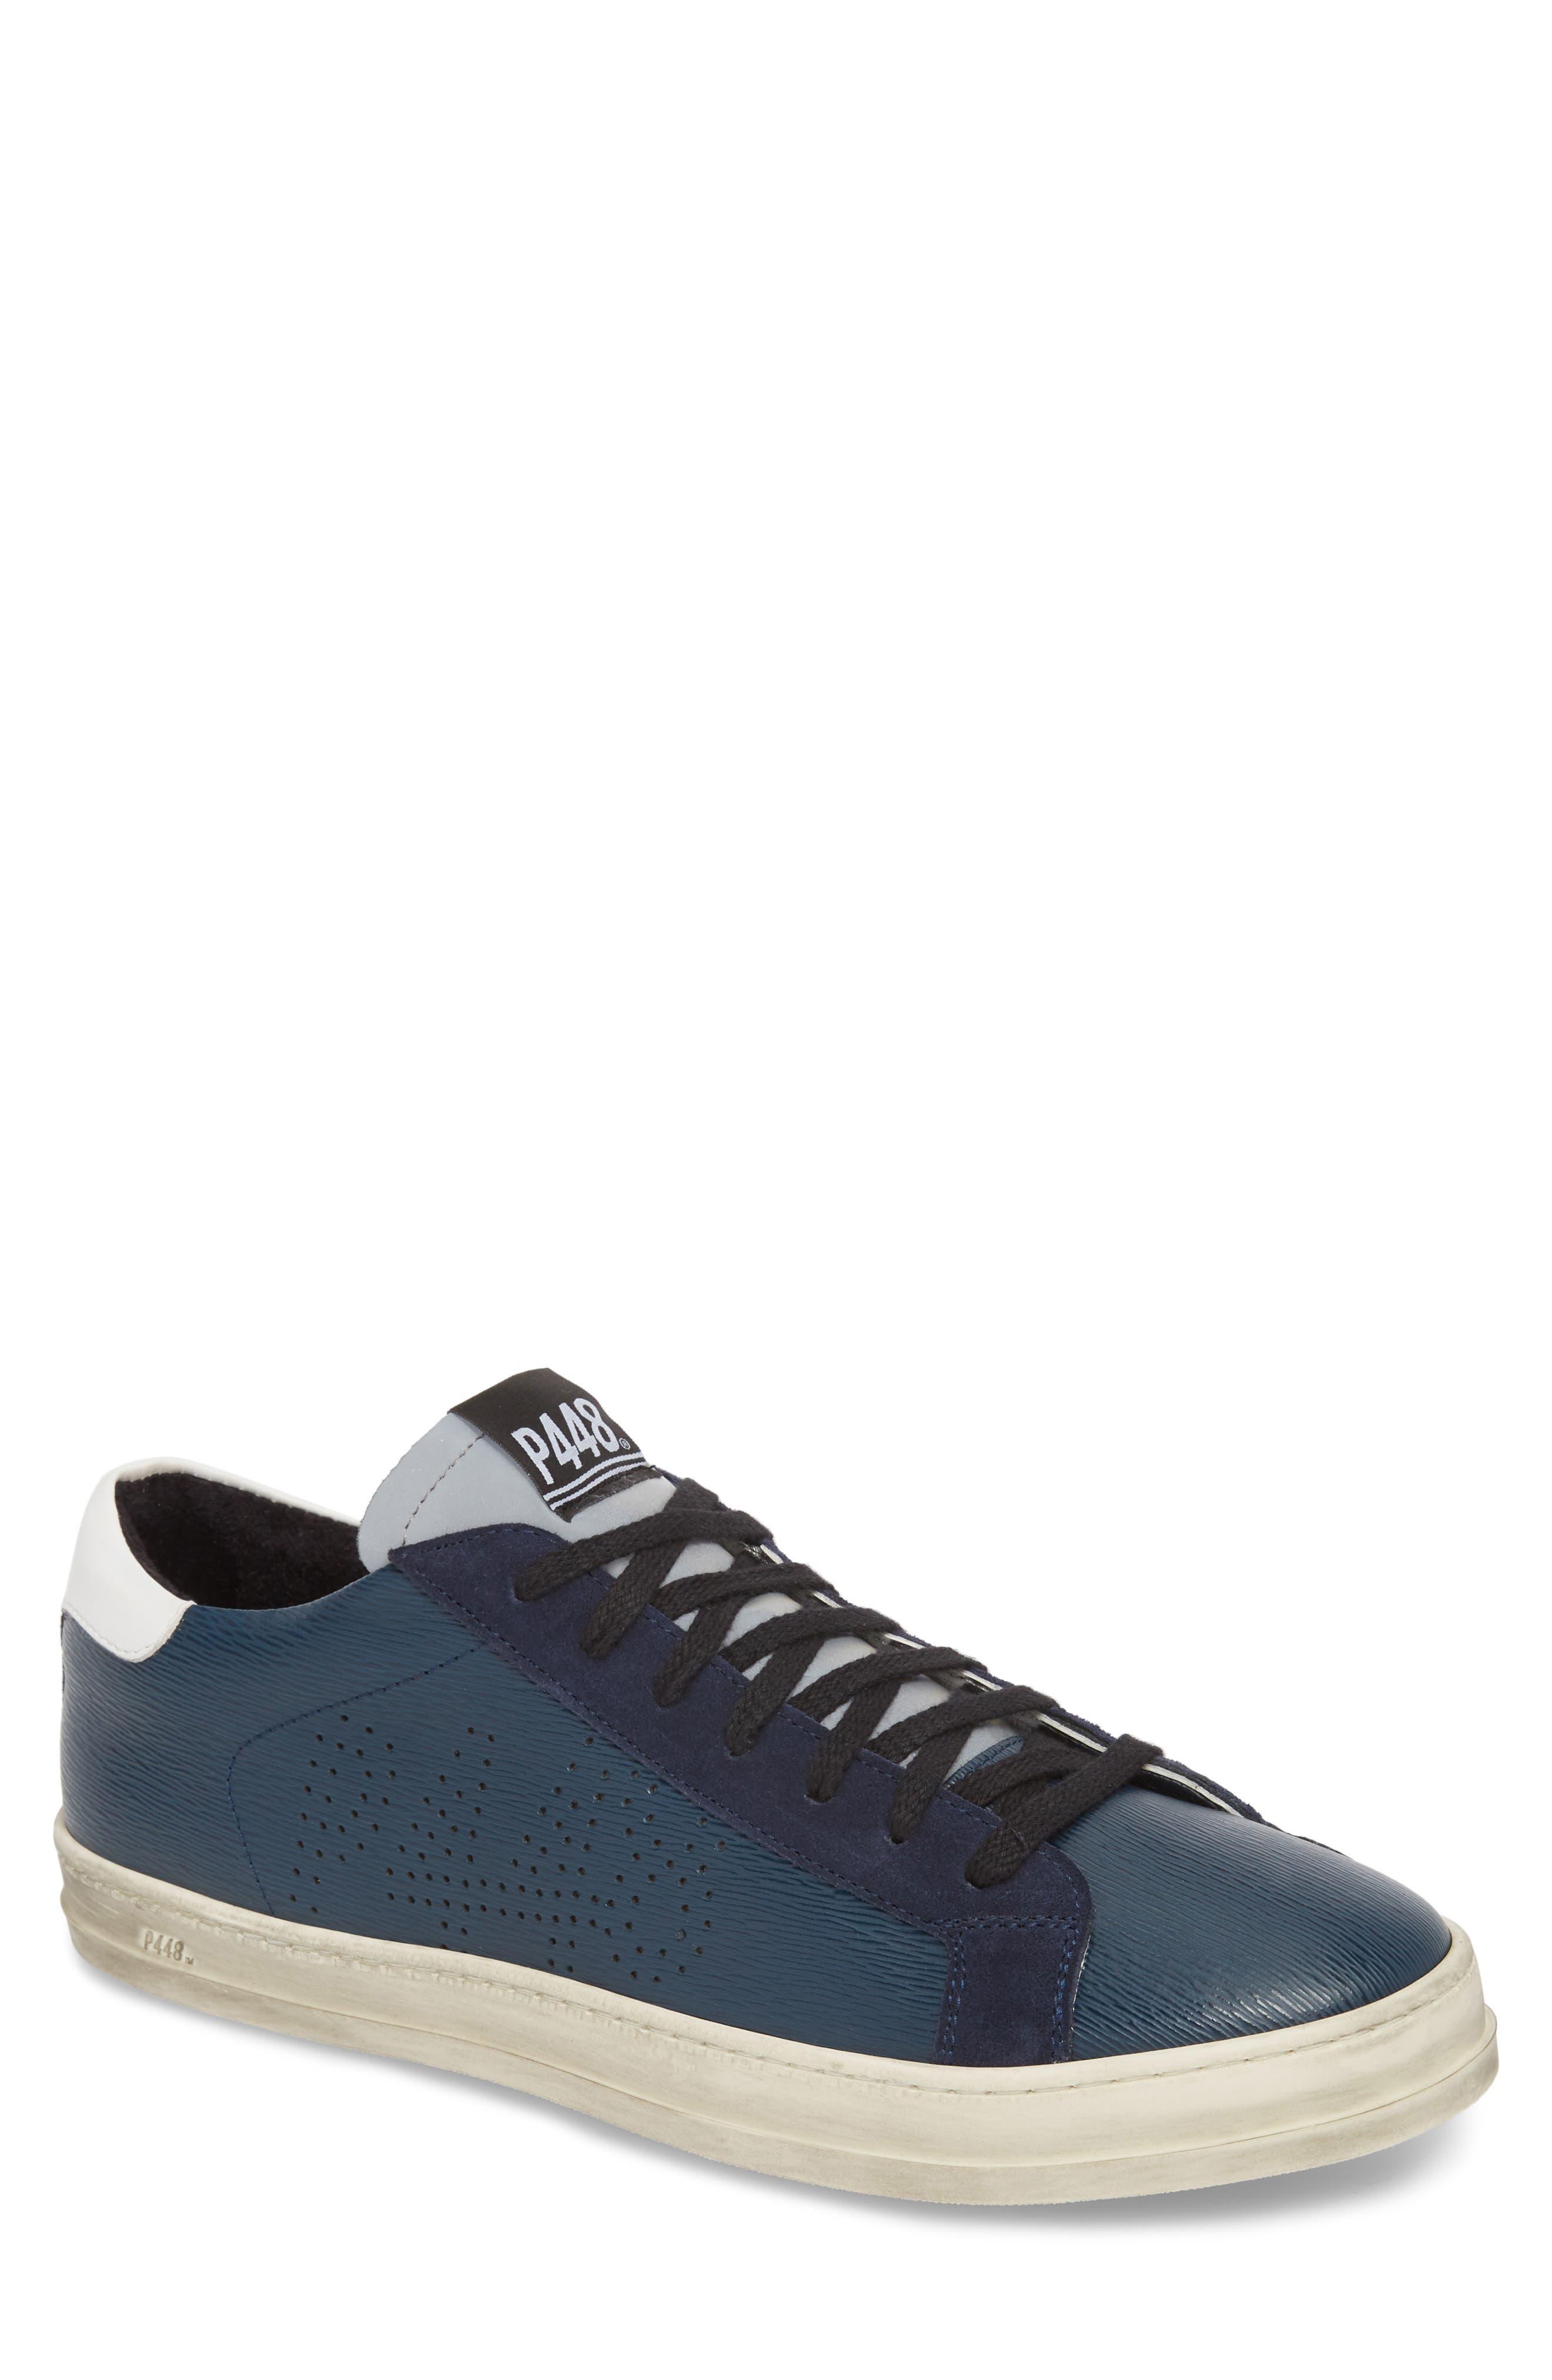 John Low Top Sneaker,                             Main thumbnail 1, color,                             Navy